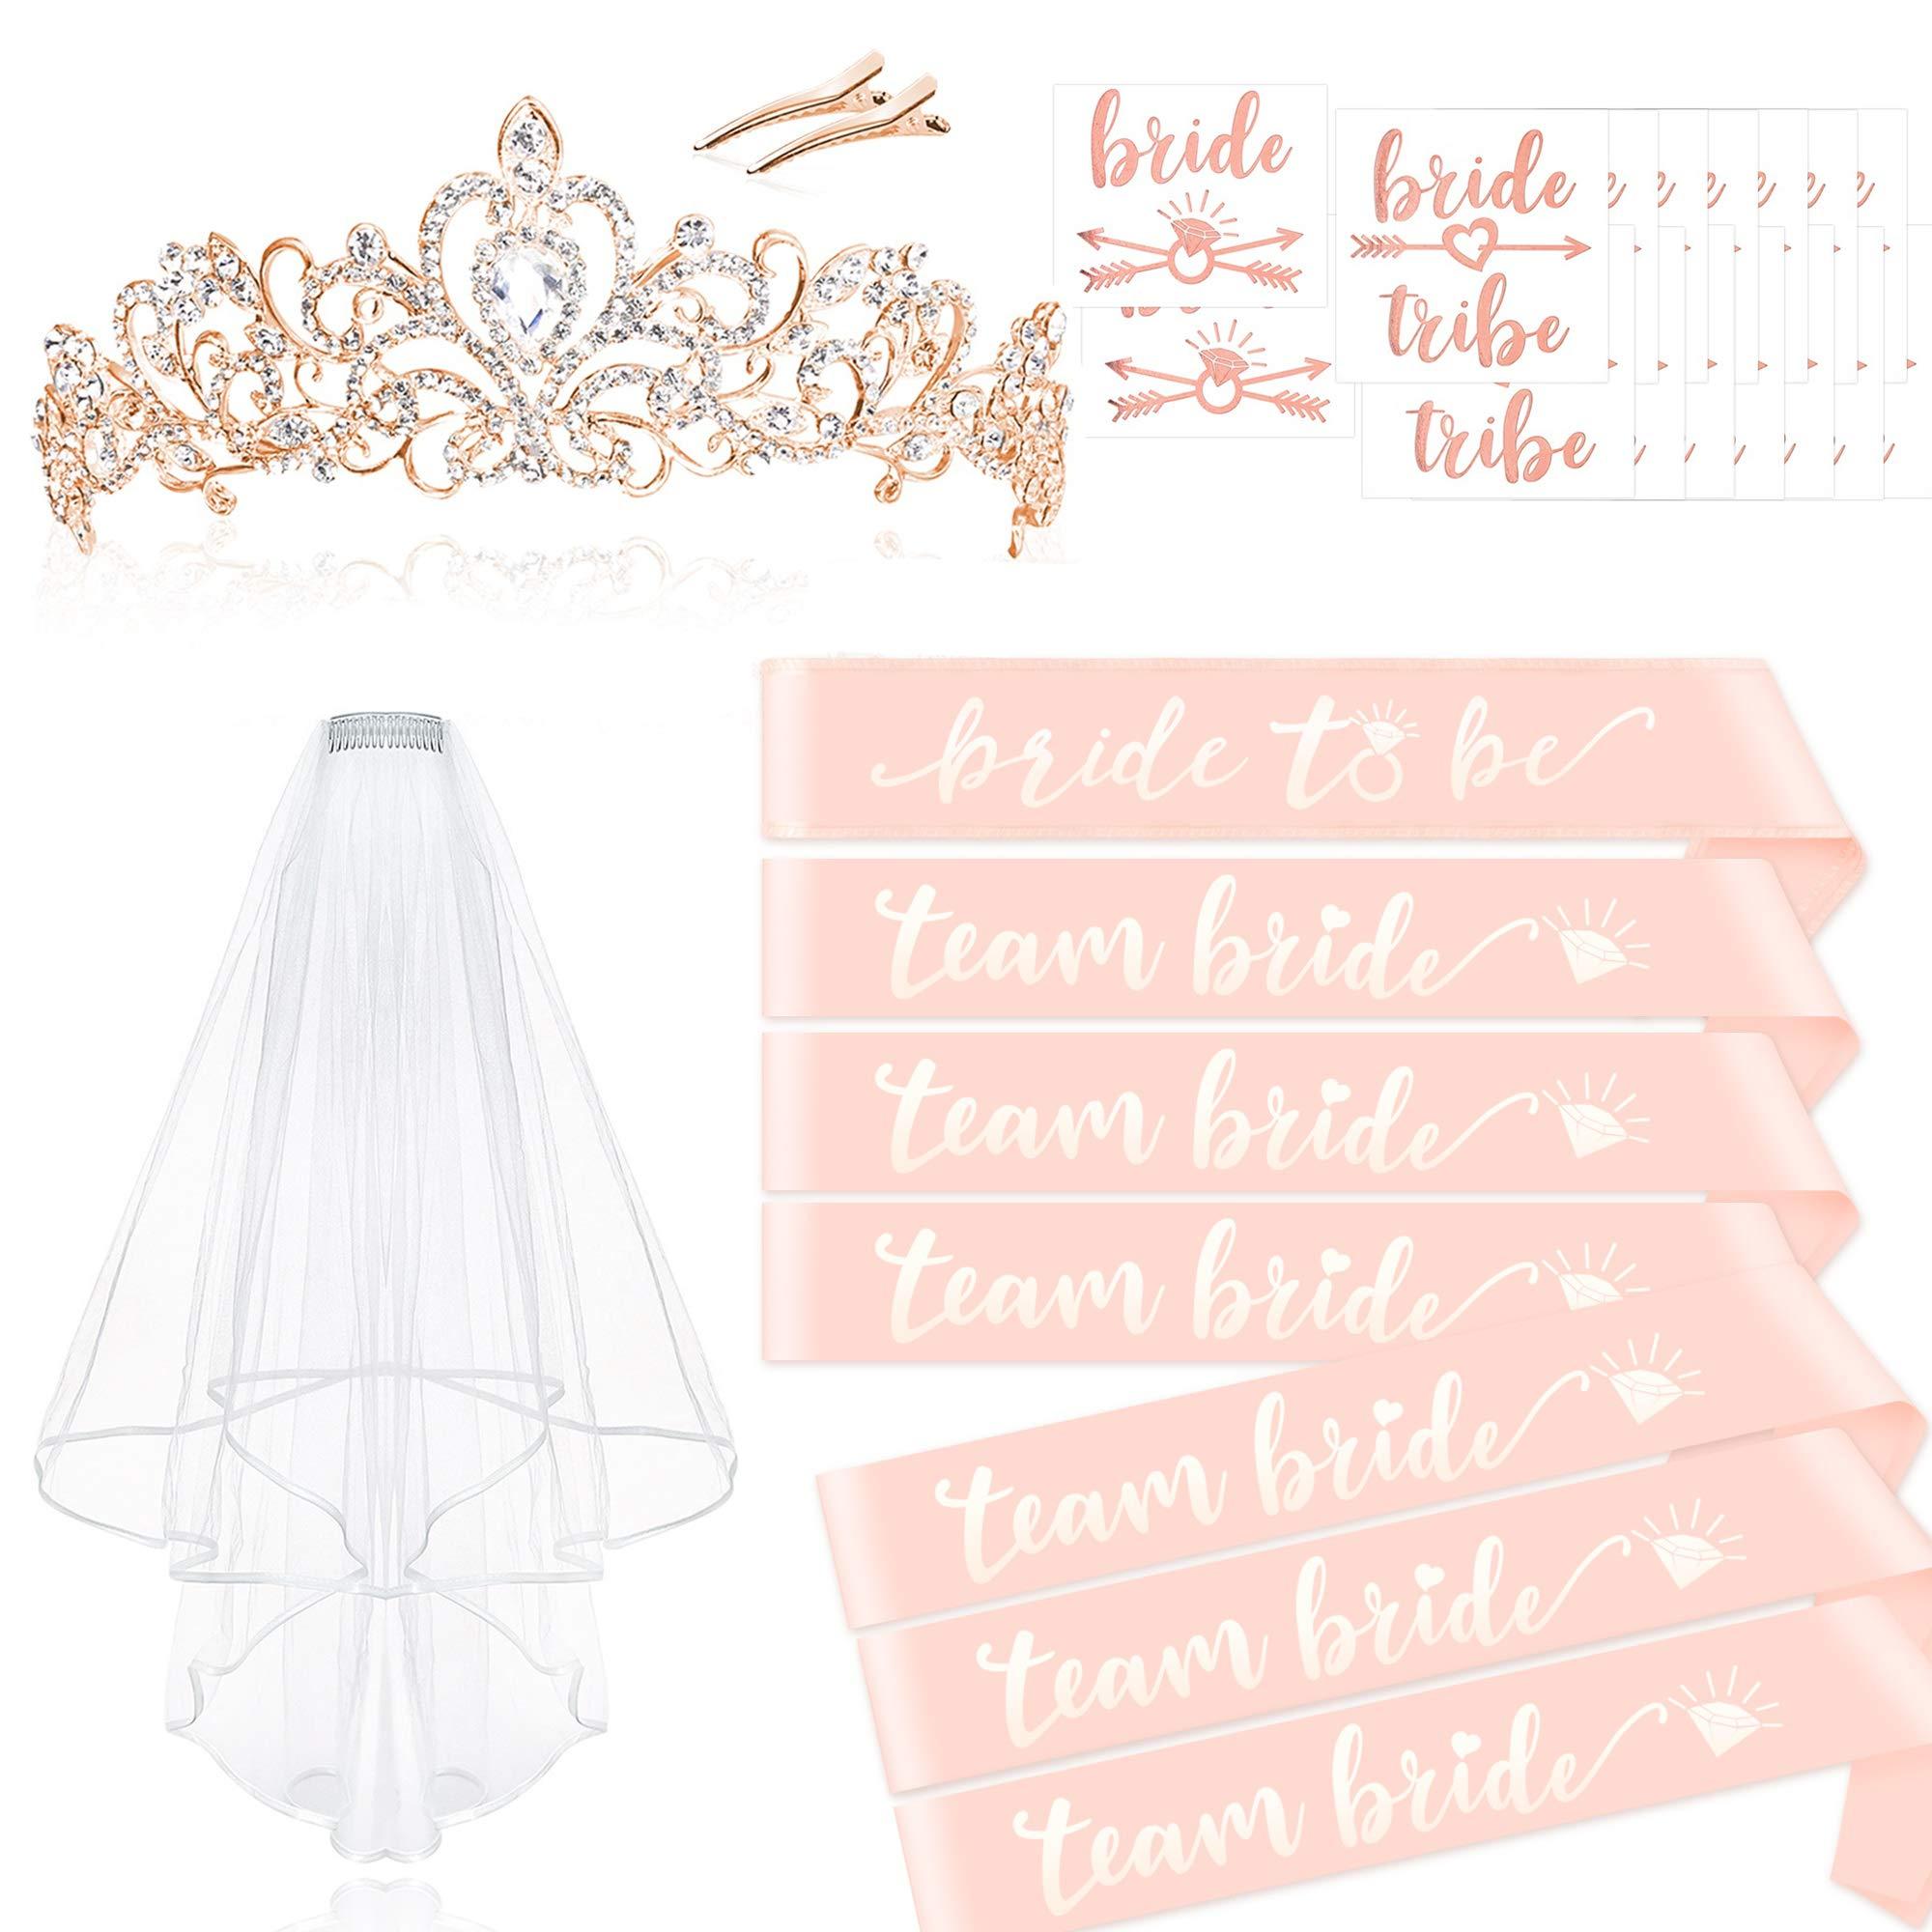 Konsait Rose Gold Pink Bachelorette Party Decorations Kit - Bridal Shower Supplies | Bride to Be Team Bride Sash, Rhinestone Tiara,Veil with Comb+ Bride Tribe Tattoo,Wedding Bridal Shower